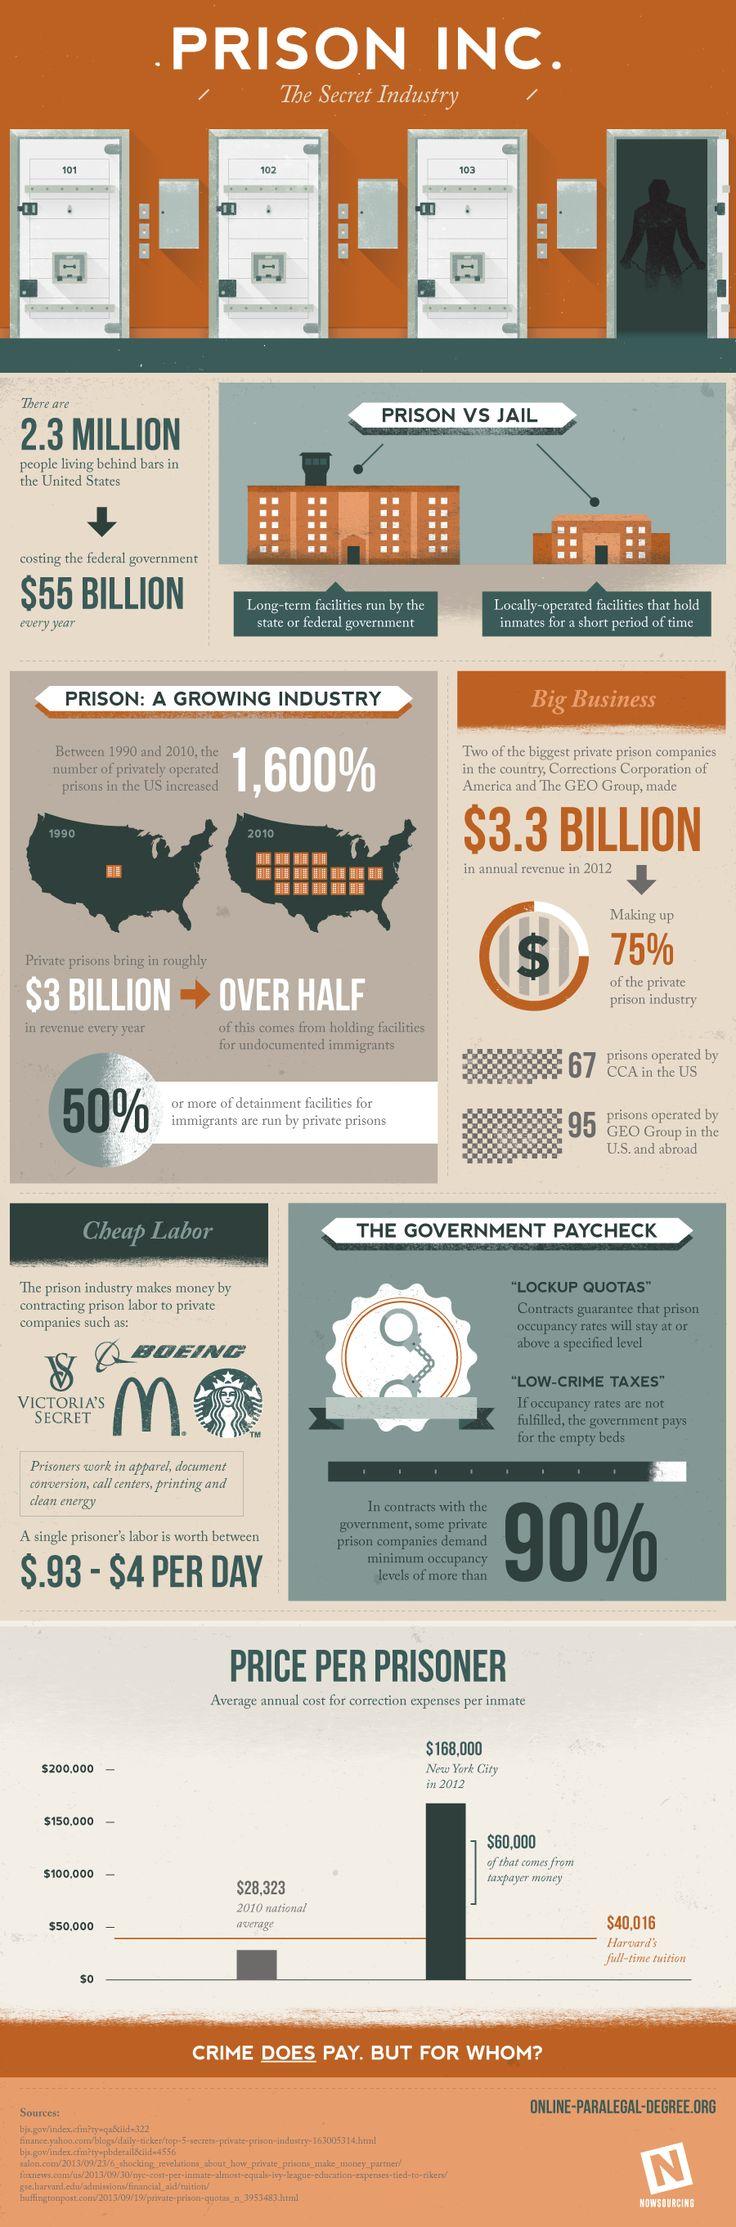 Prison, Inc - The Secret Industry  #Infographic #Prison #SecretIndustry